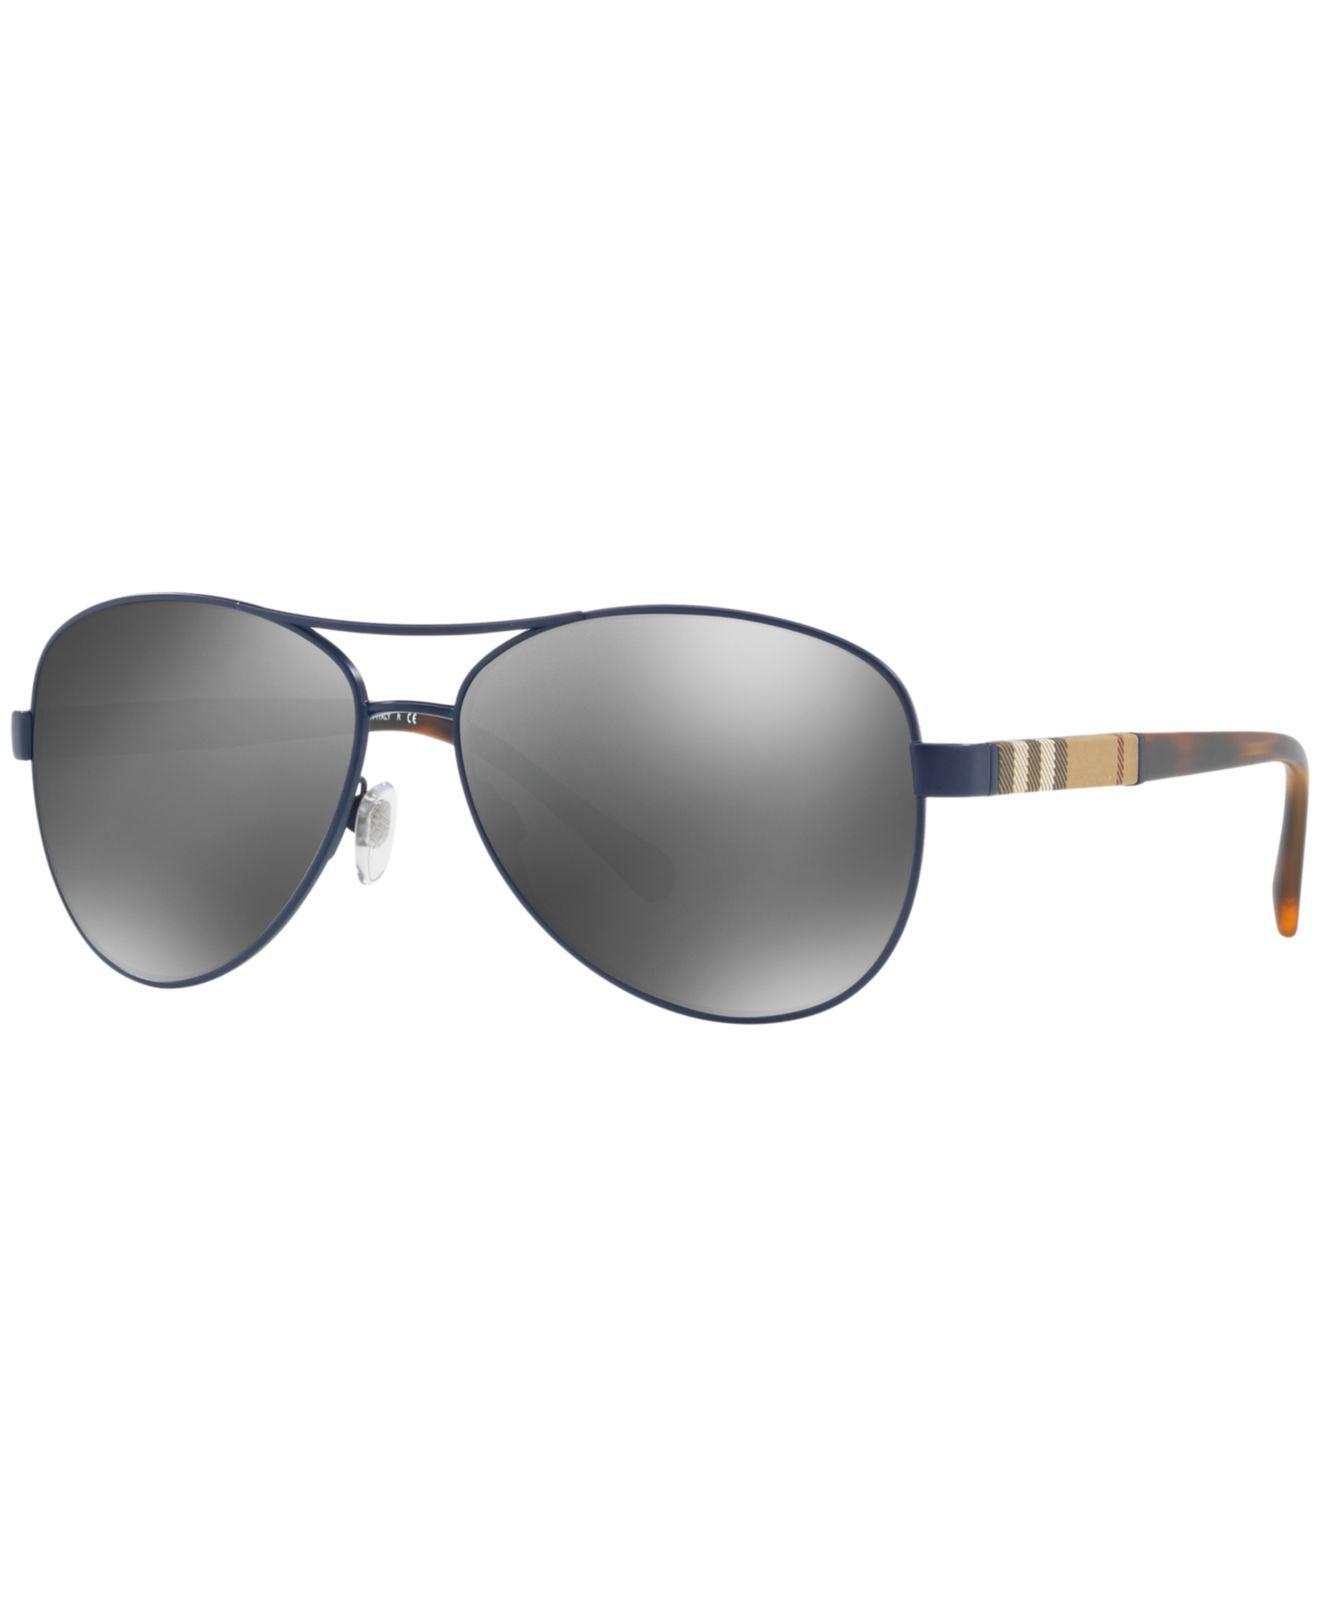 b485ee0f7f9 Burberry. Women s Gray Sunglasses